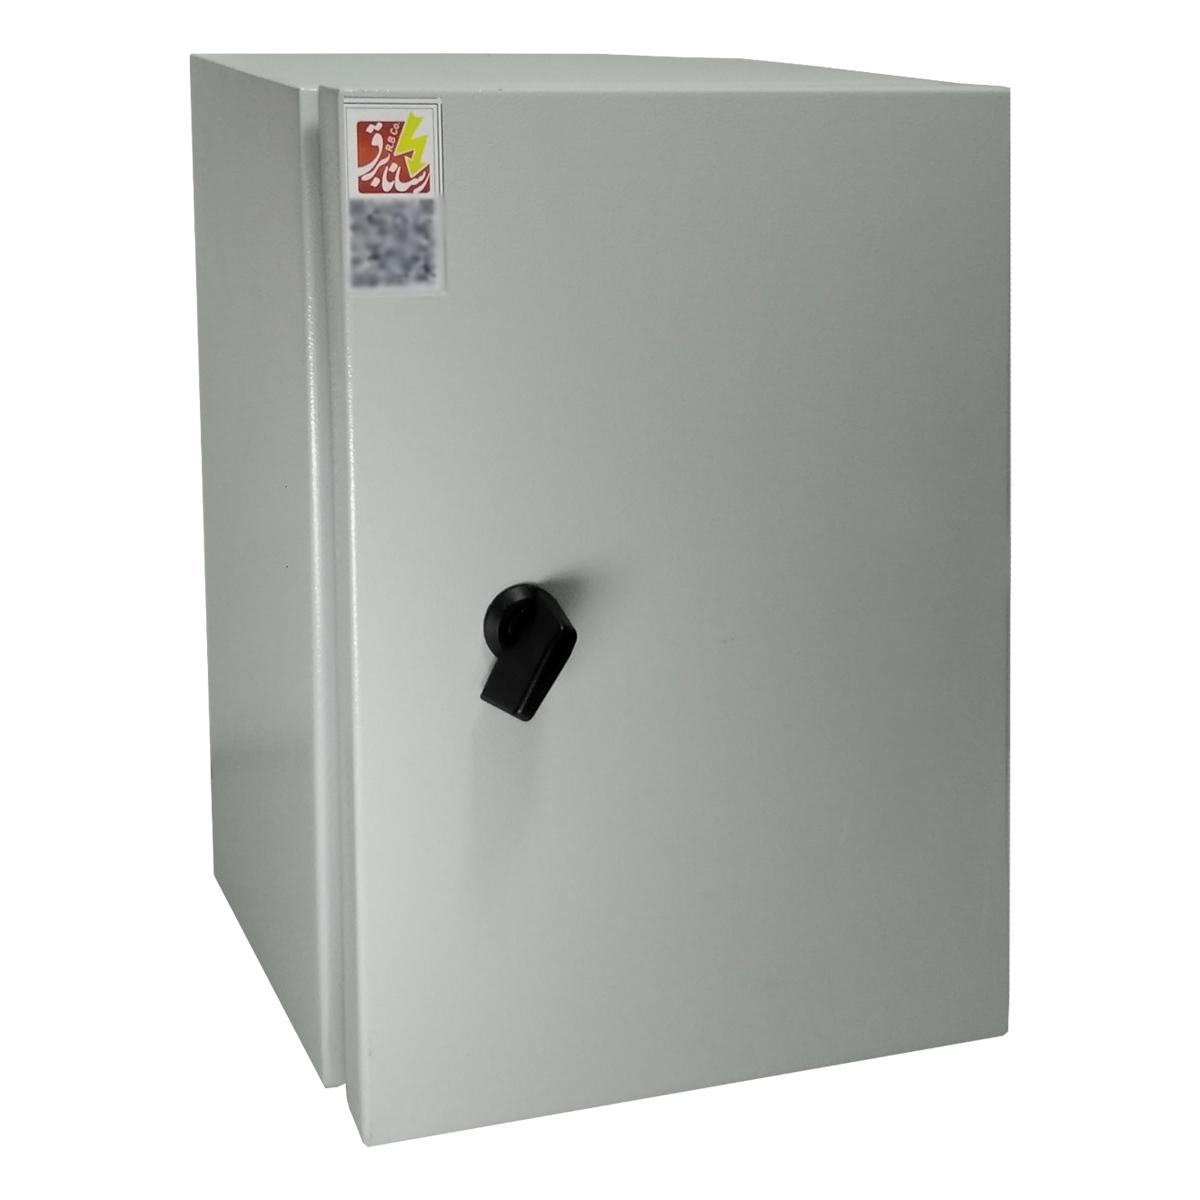 تابلو برق رسانا برق مدل 35×25×15